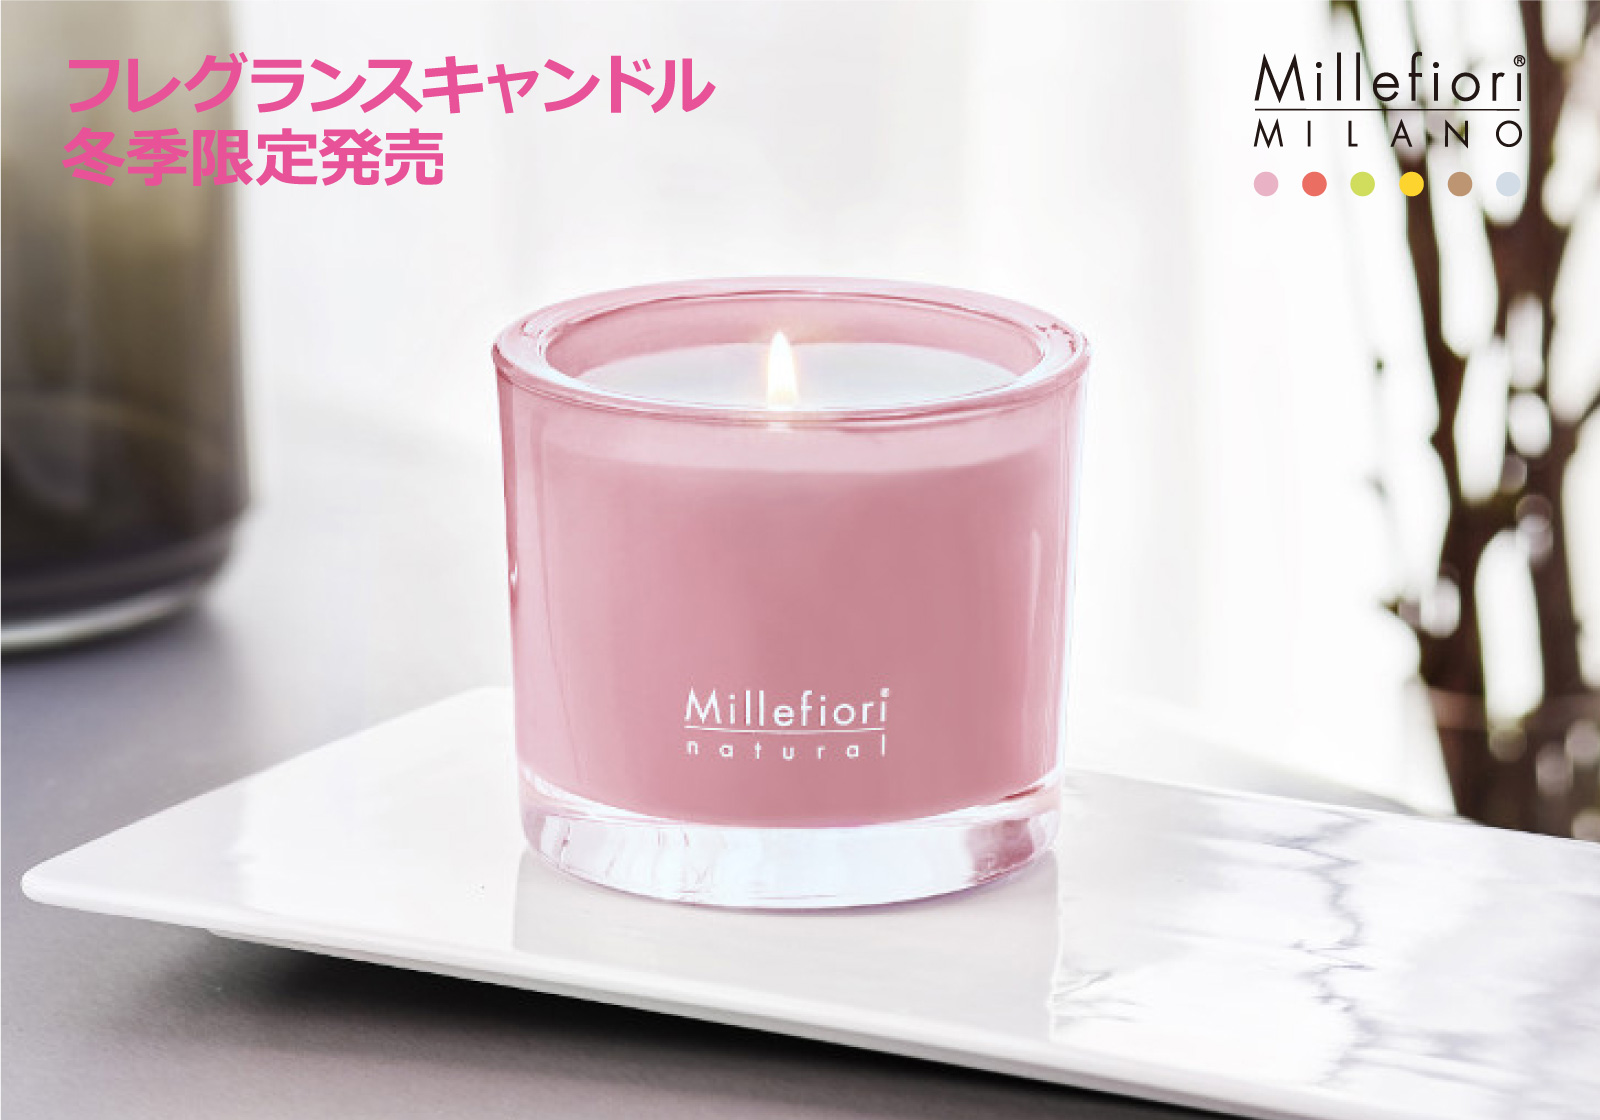 Millefiori 限定キャンドル